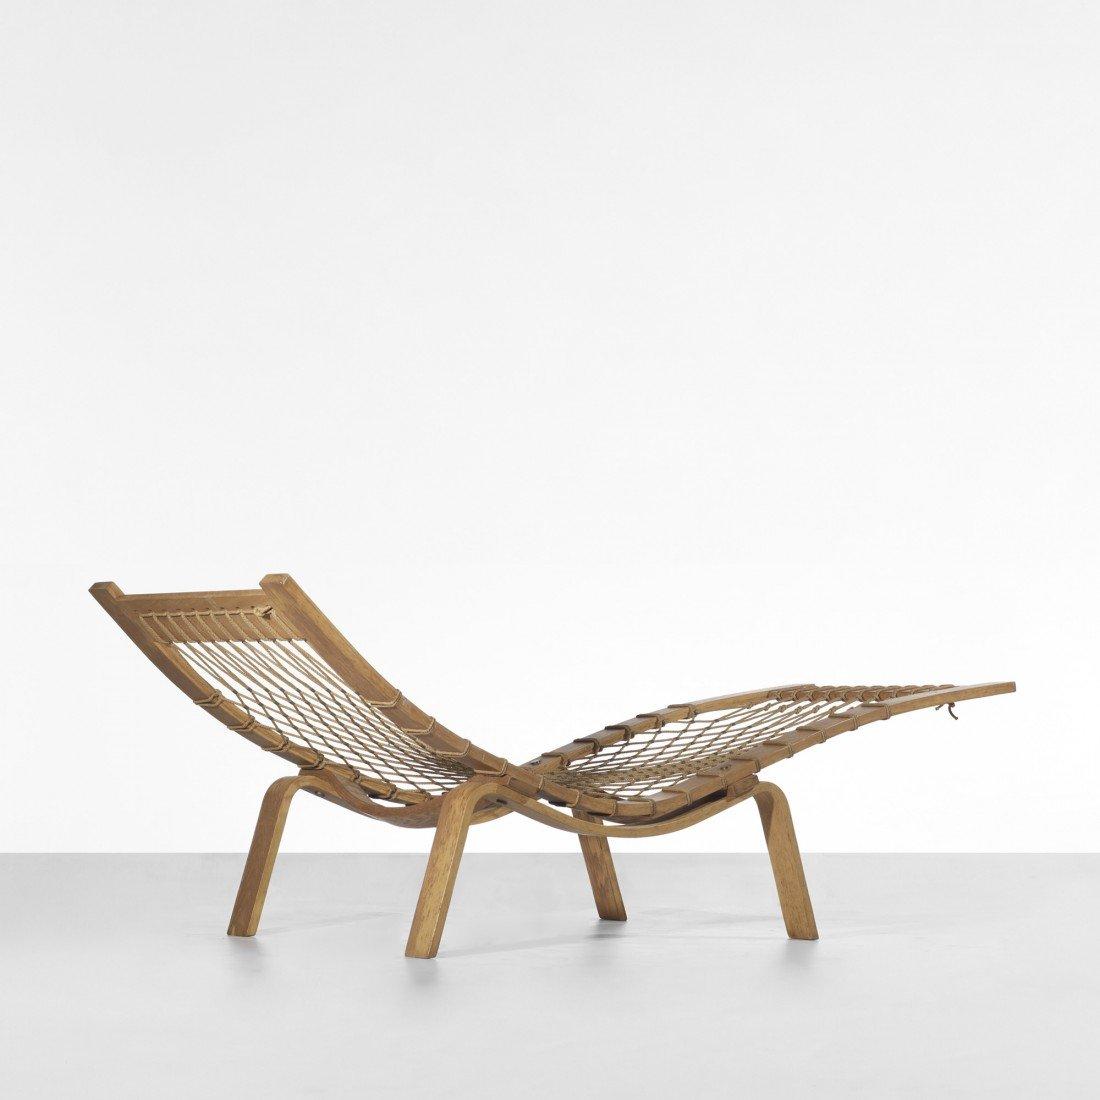 110: Hans Wegner Hammock chaise lounge